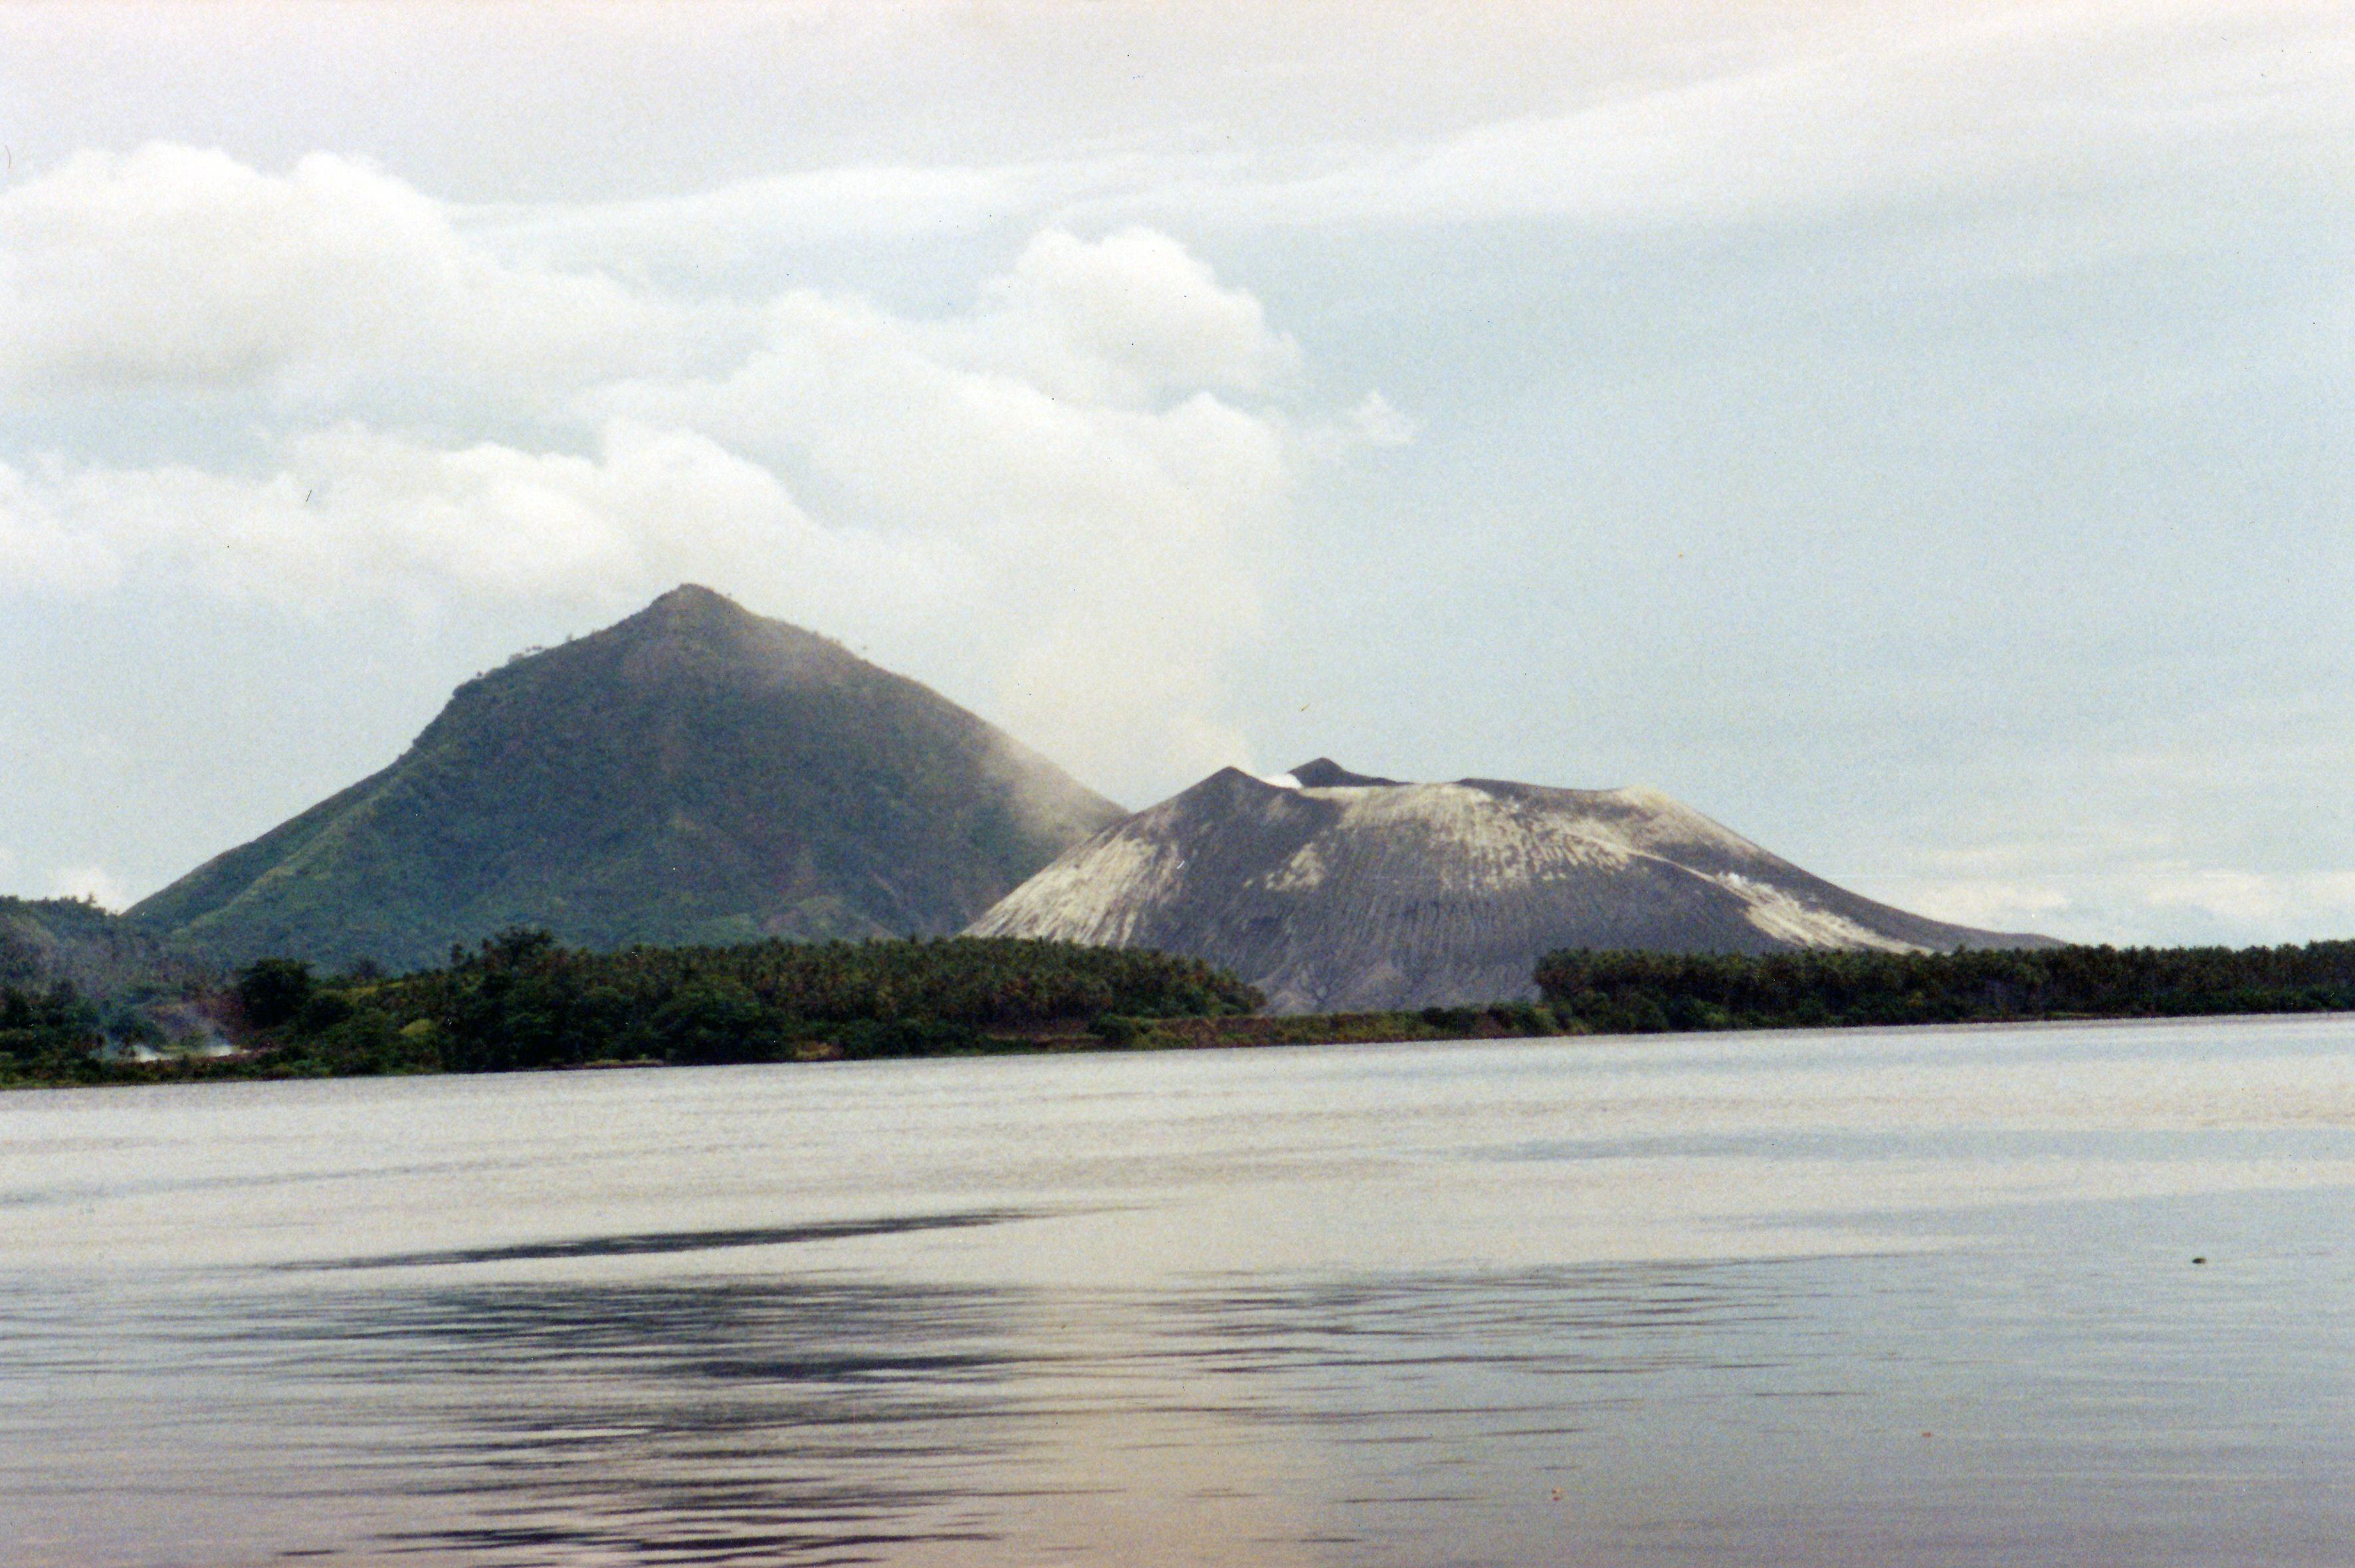 World is beautiful - Rabaul caldera ツ